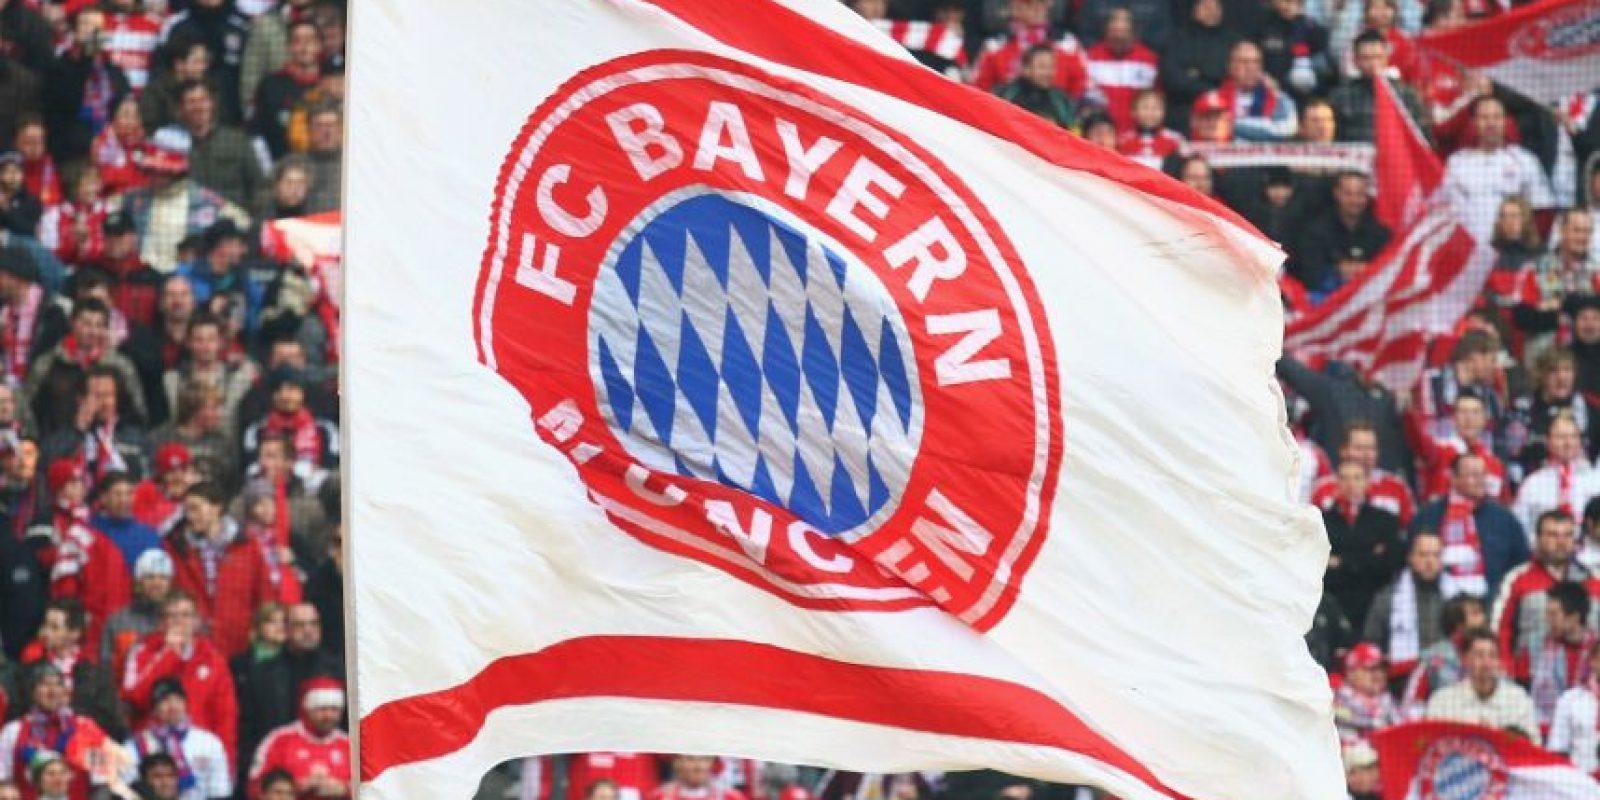 9. Bayern Munich Foto:Getty Images